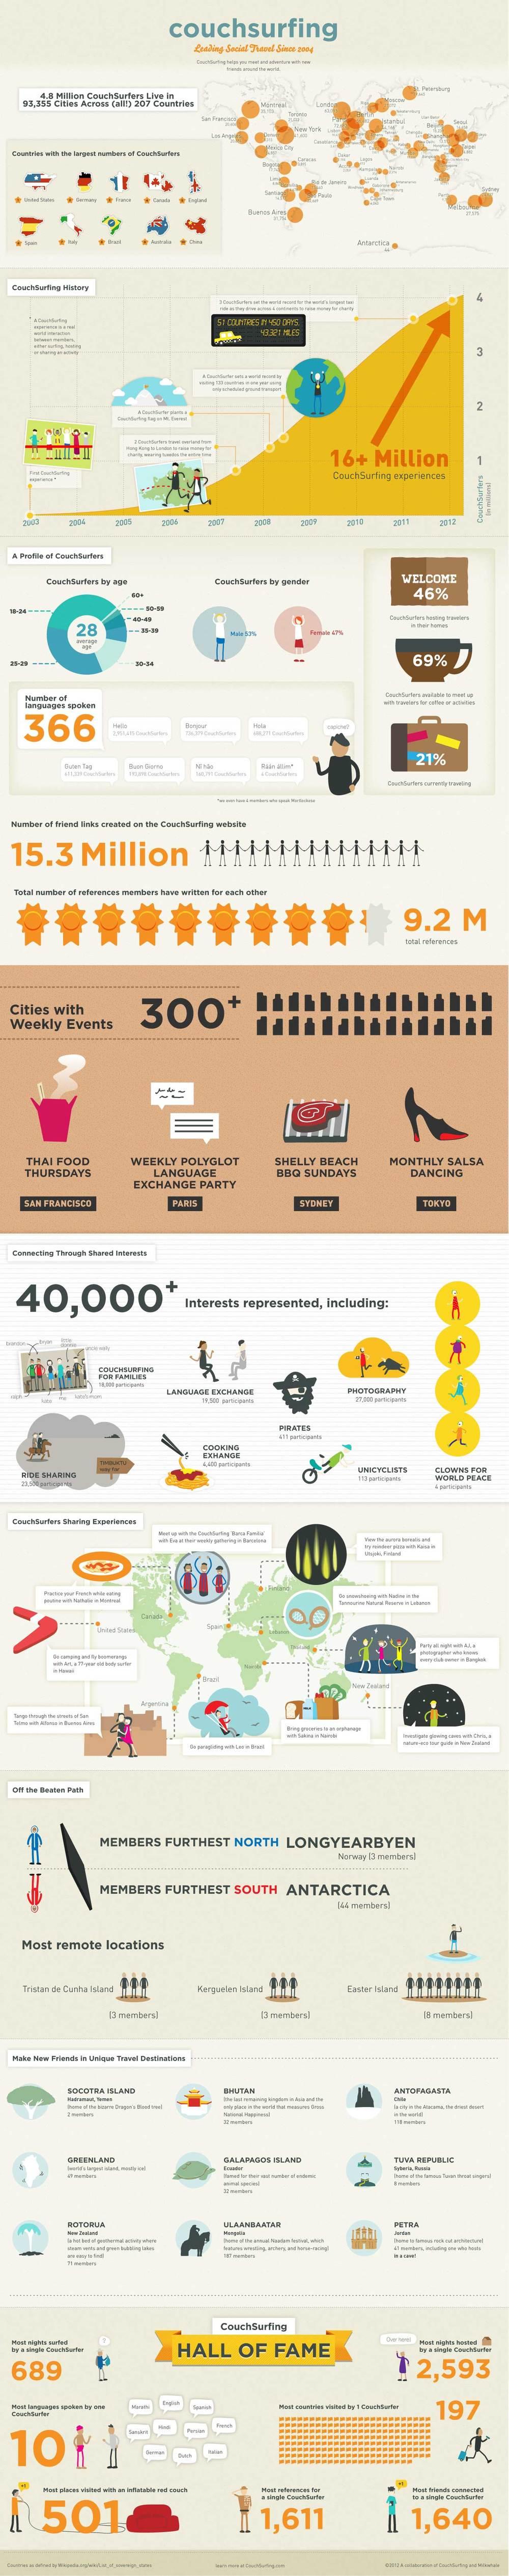 Инфографика с разными фактами о проекте. Источник:http://www.couchsurfing.org/about/